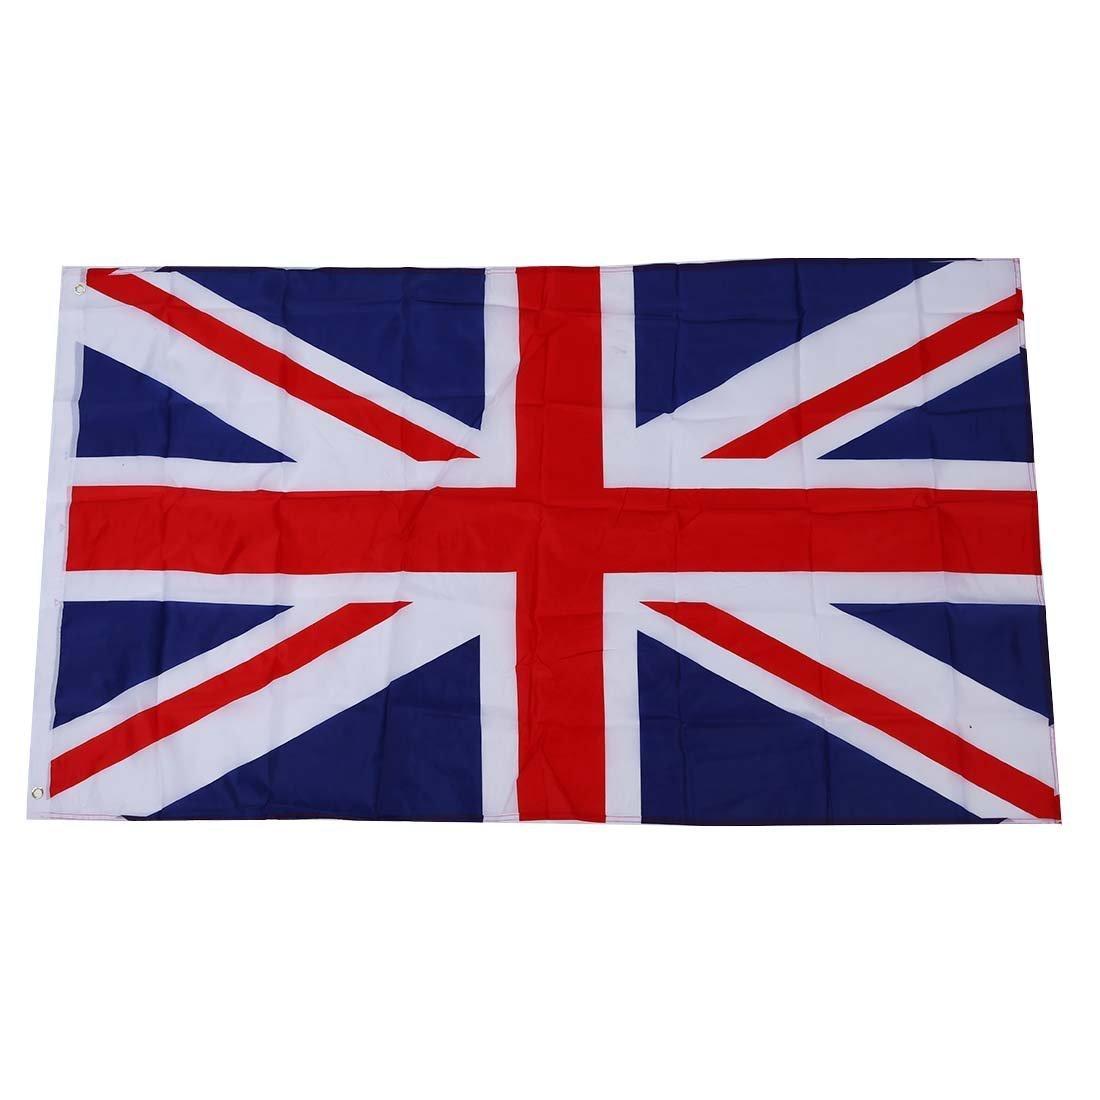 TOOGOO (R) Grande 90x150cm 5 X 3FT tifosi Olimpiadi National Sports bandiere con passacavo - bandiera britannica